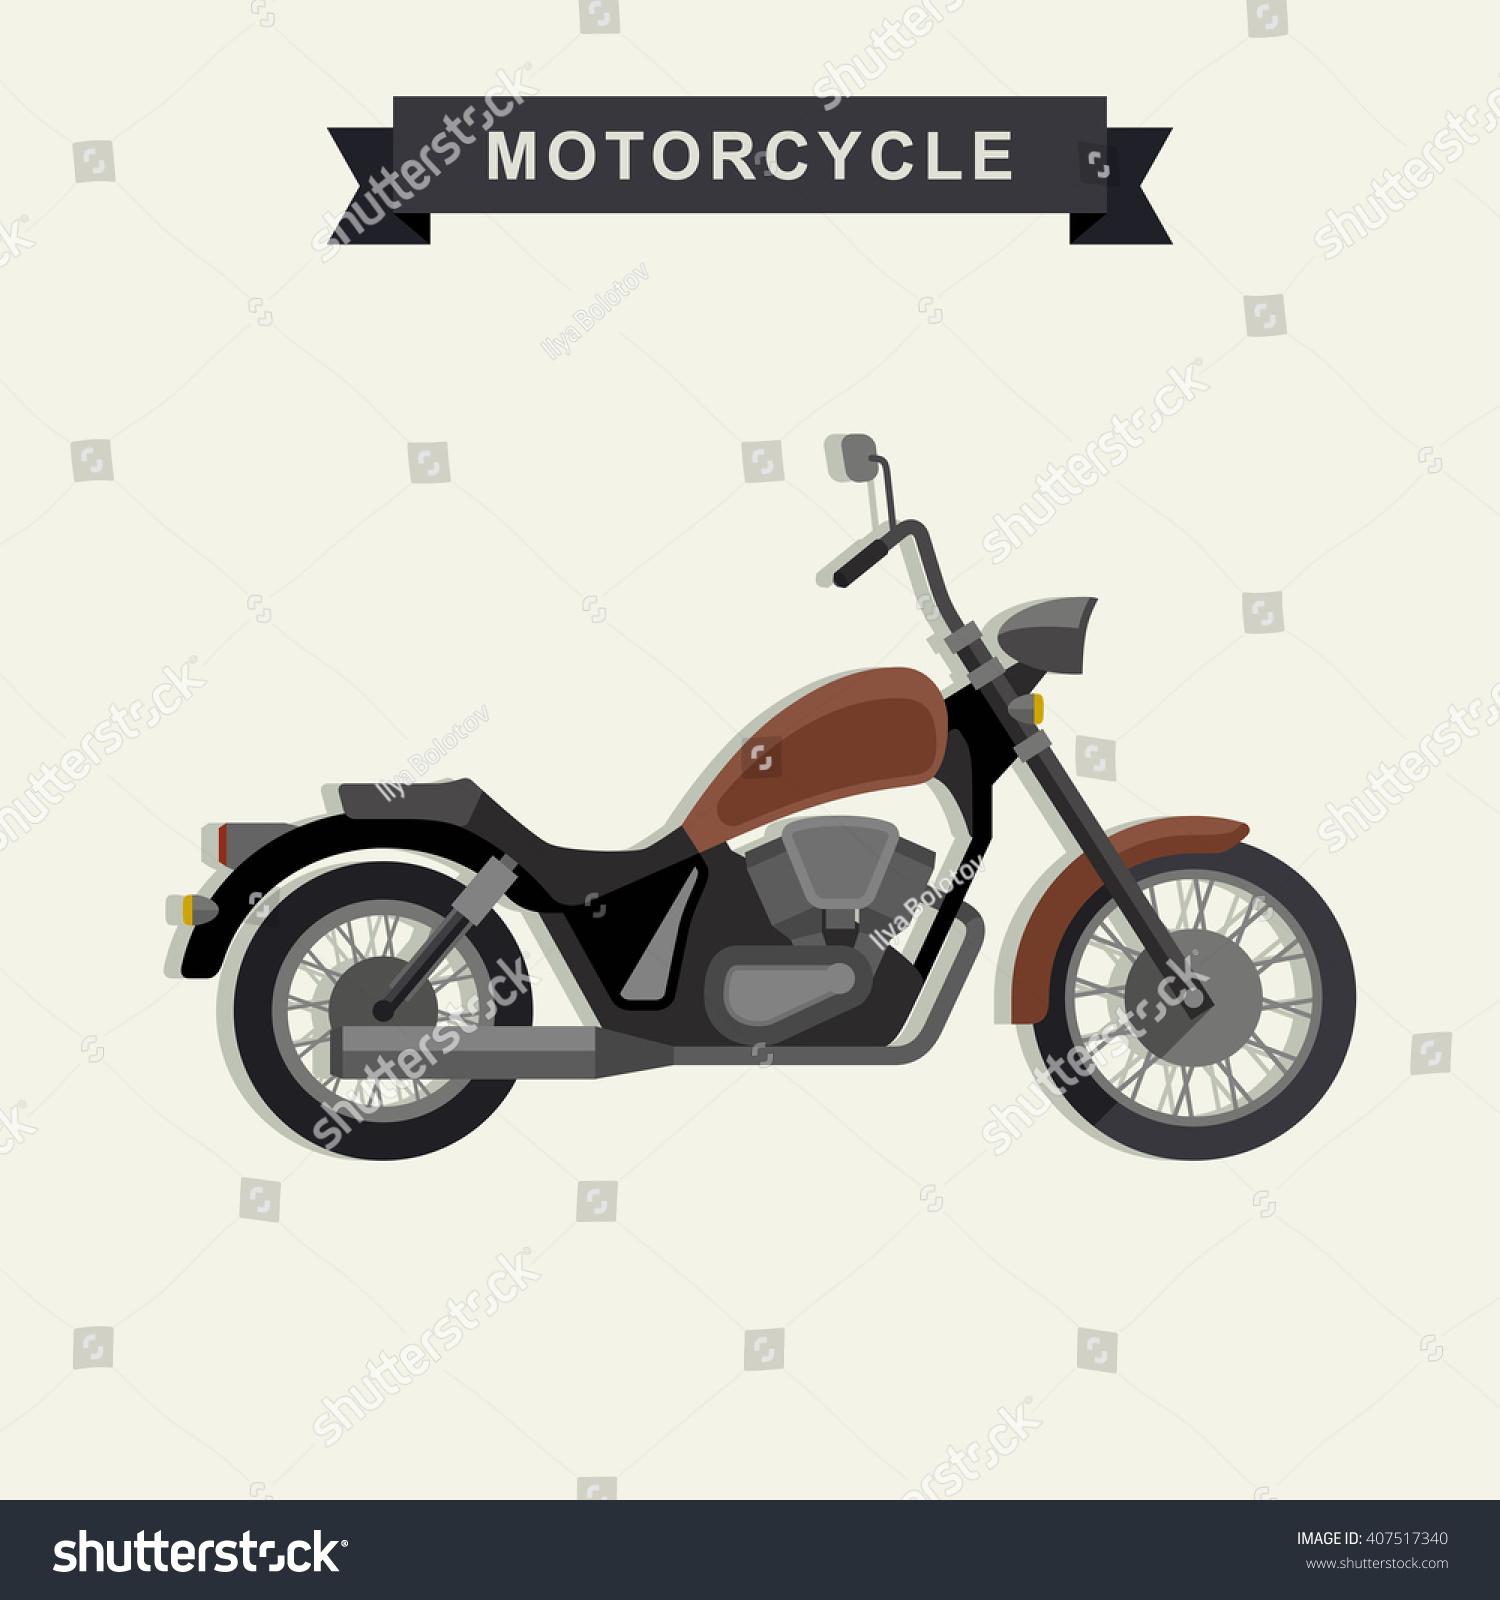 Chopper Motorcycle Flat Style Simple Illustration Stock Illustration ...